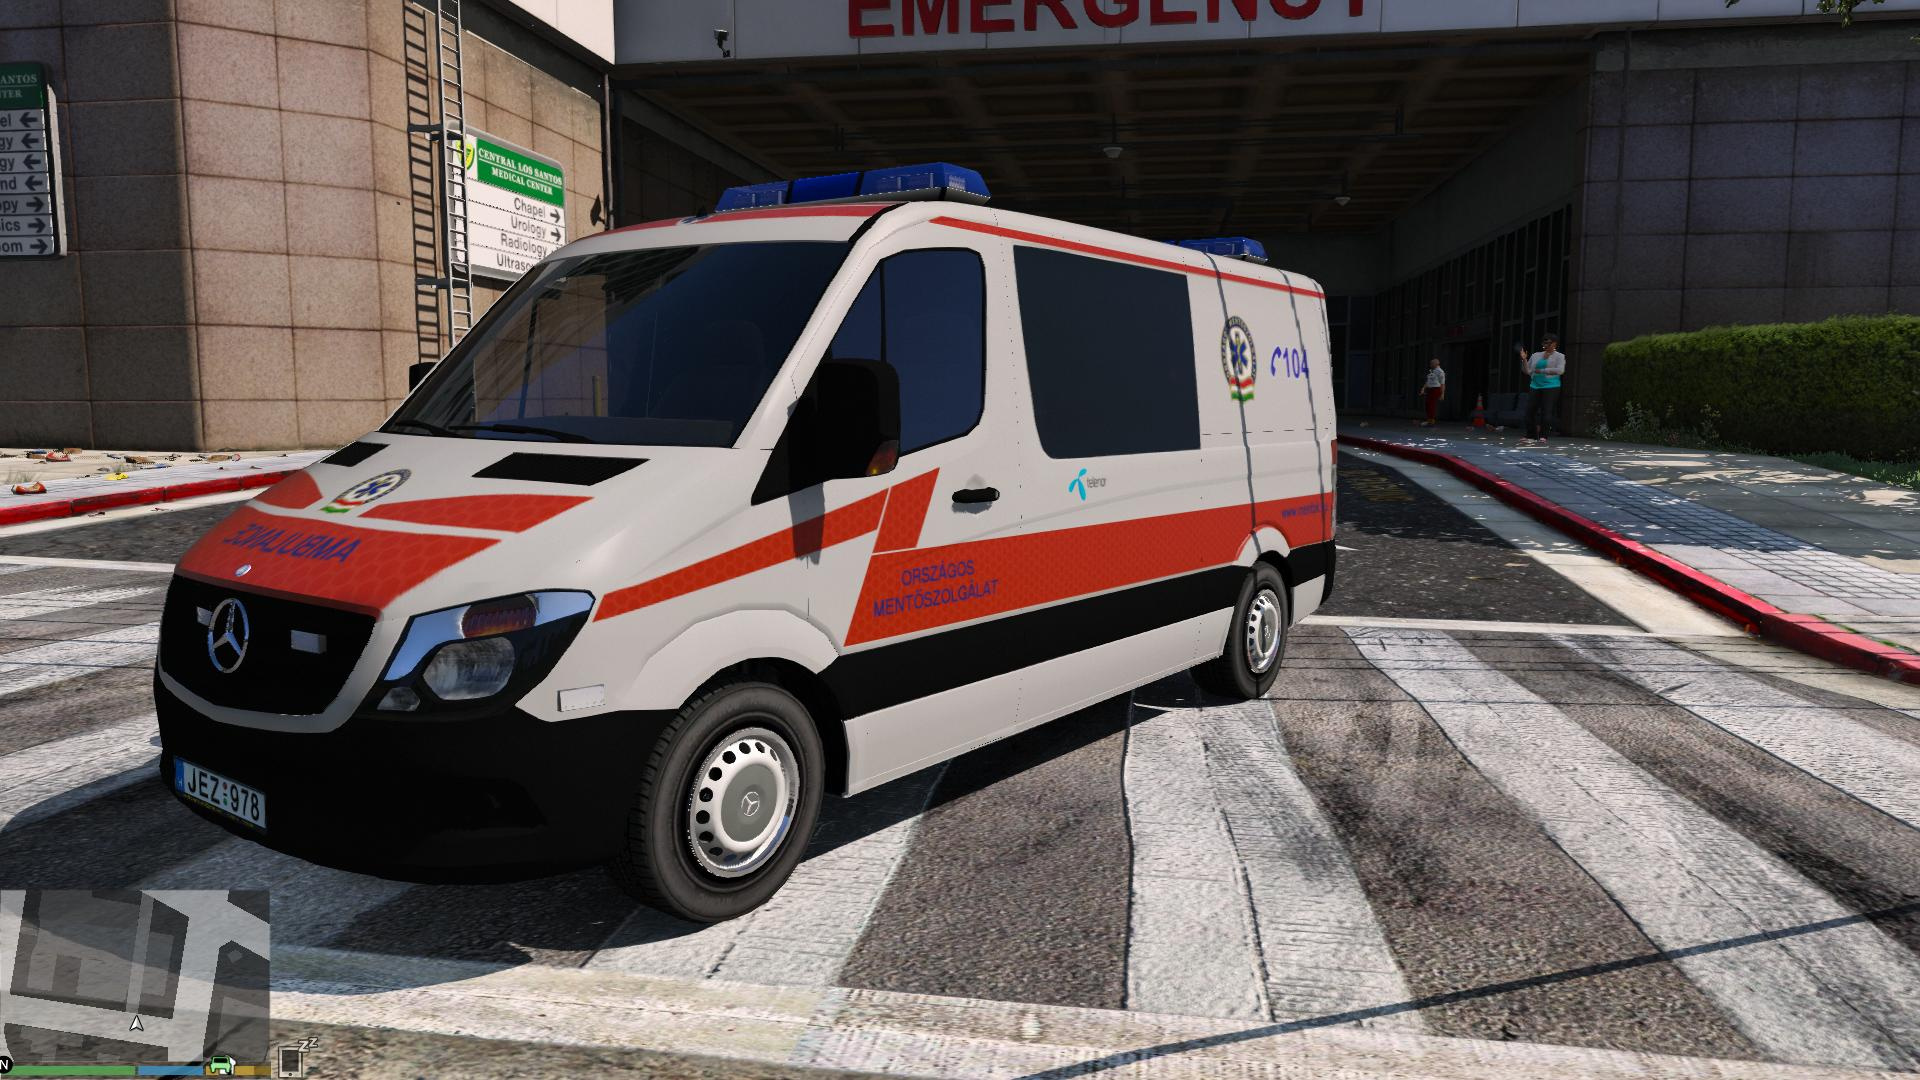 2014 Police Mercedes Sprinter Hungarian Ambulance Paintjob